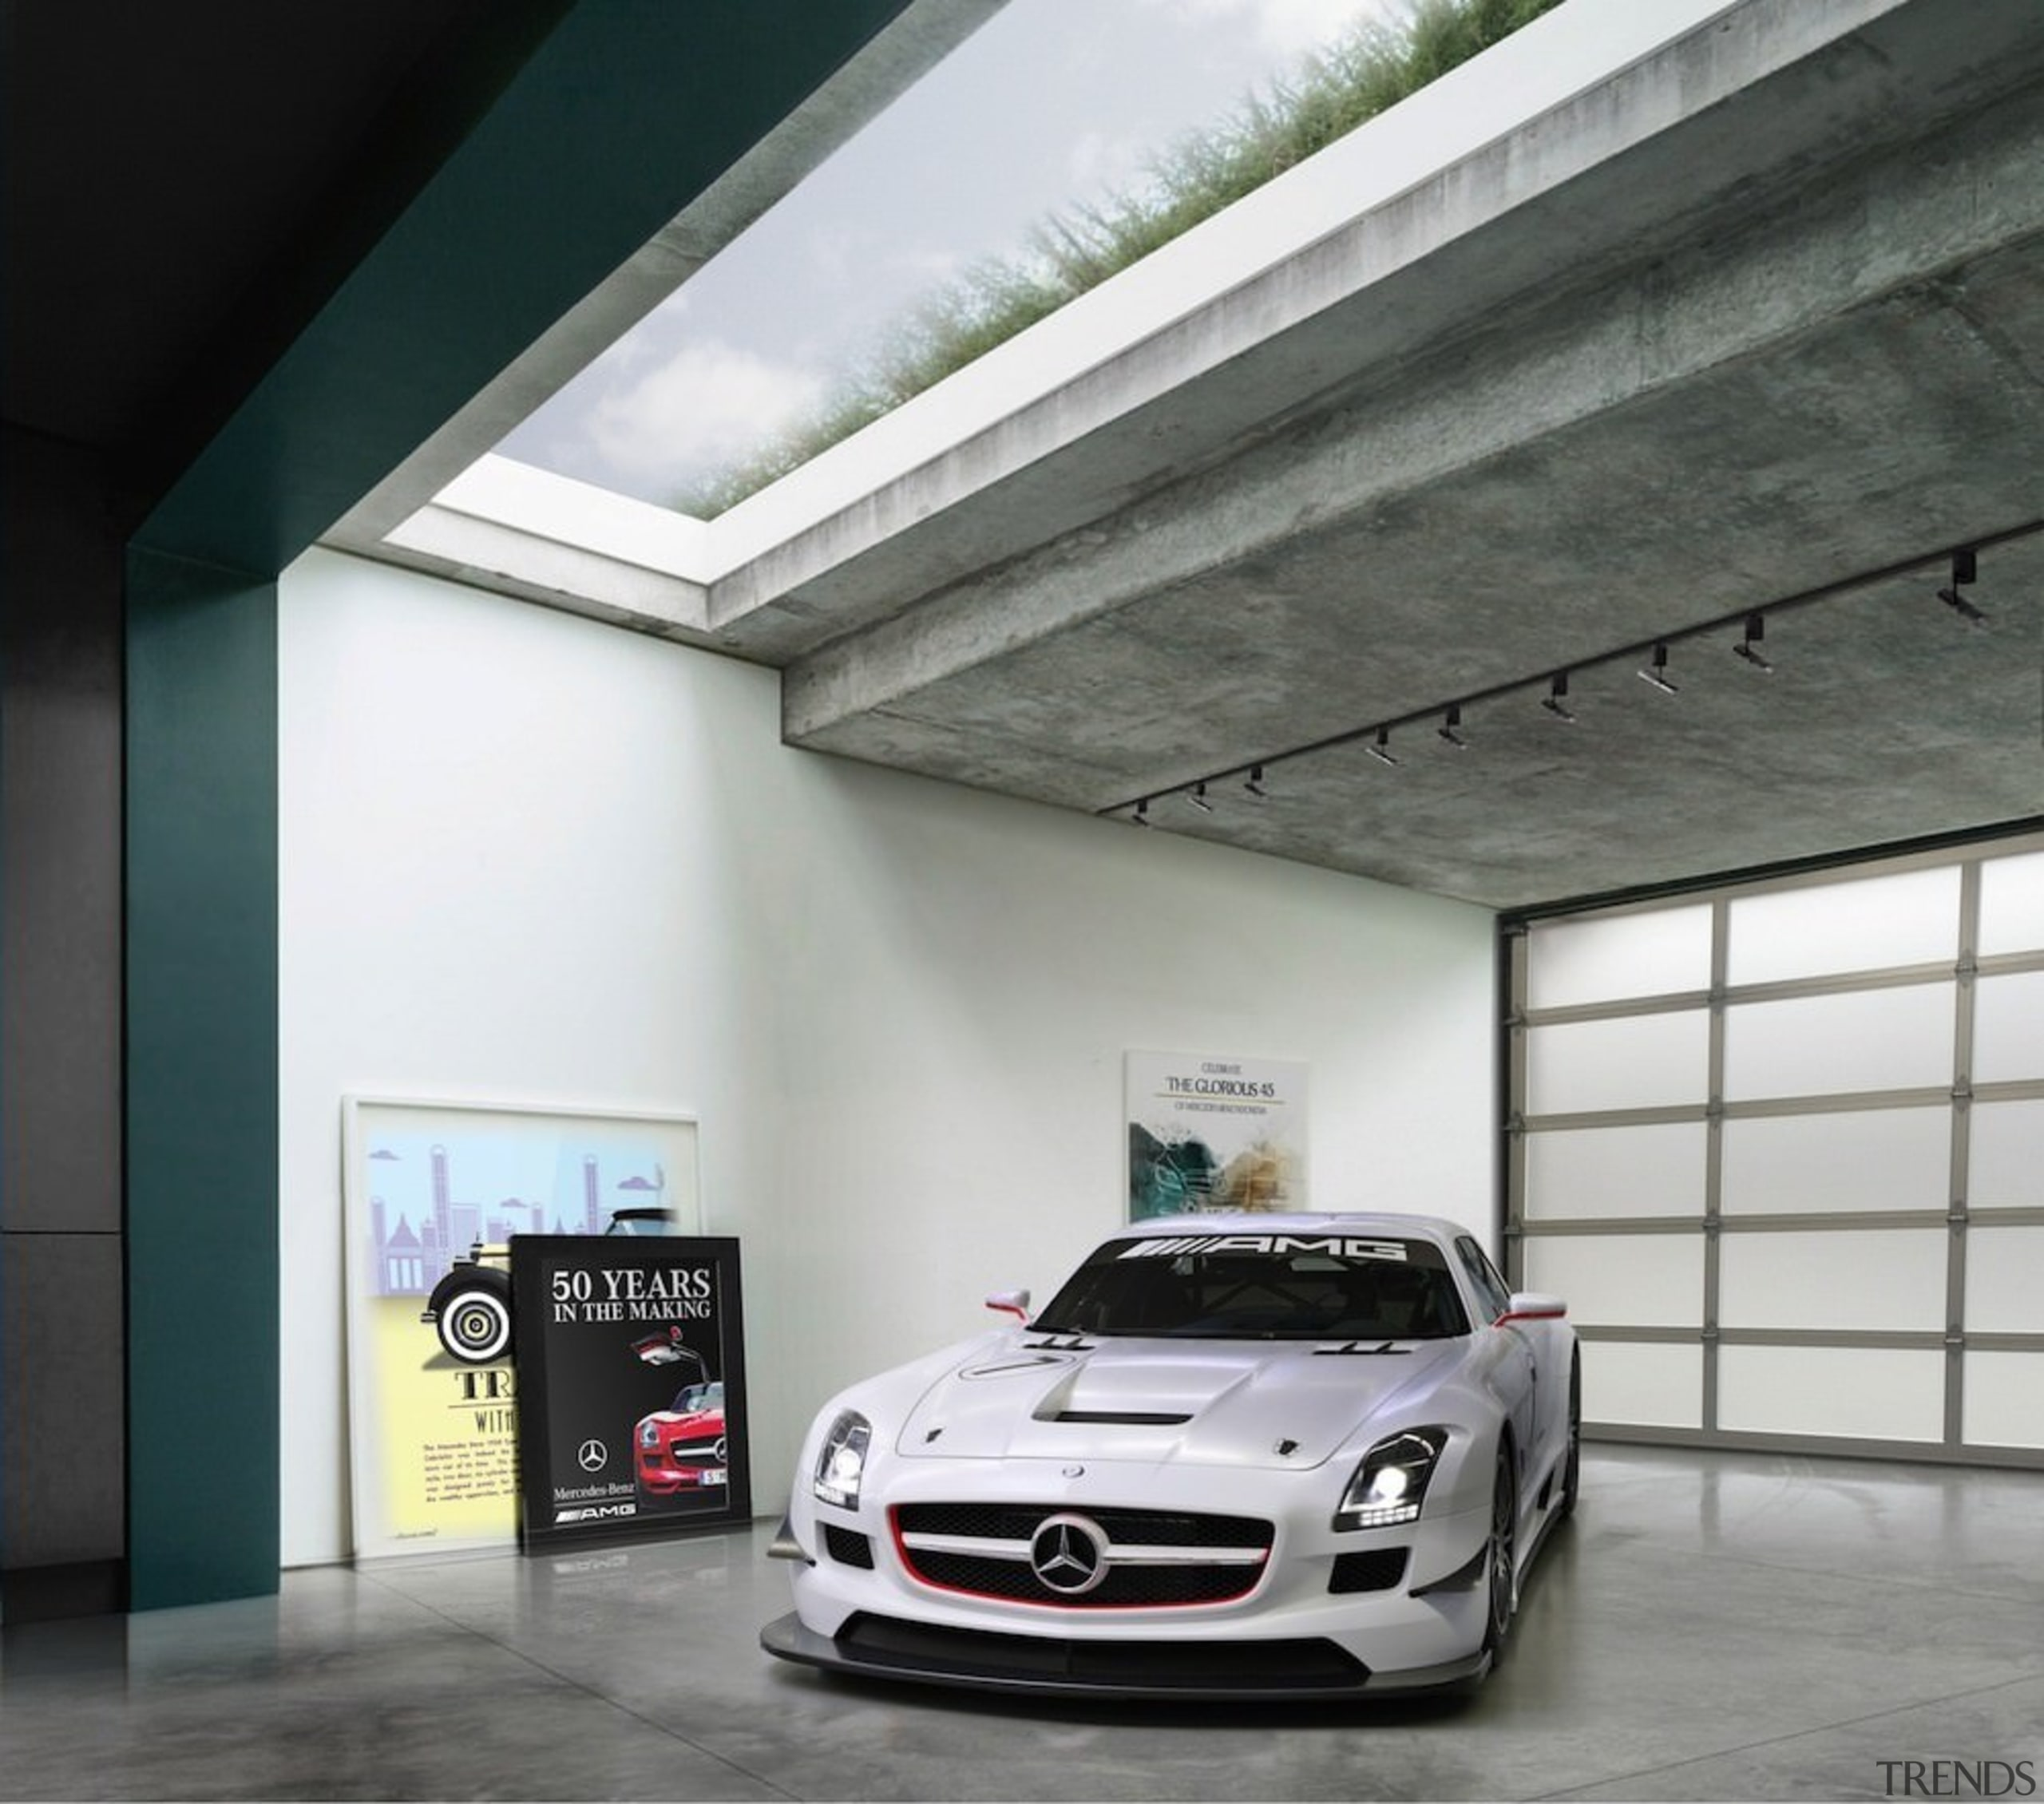 Glimpse the green roof through the skylight - automotive design, automotive exterior, building, car, garage, luxury vehicle, mercedes benz, mercedes benz sls amg, motor vehicle, performance car, personal luxury car, sports car, vehicle, gray, black